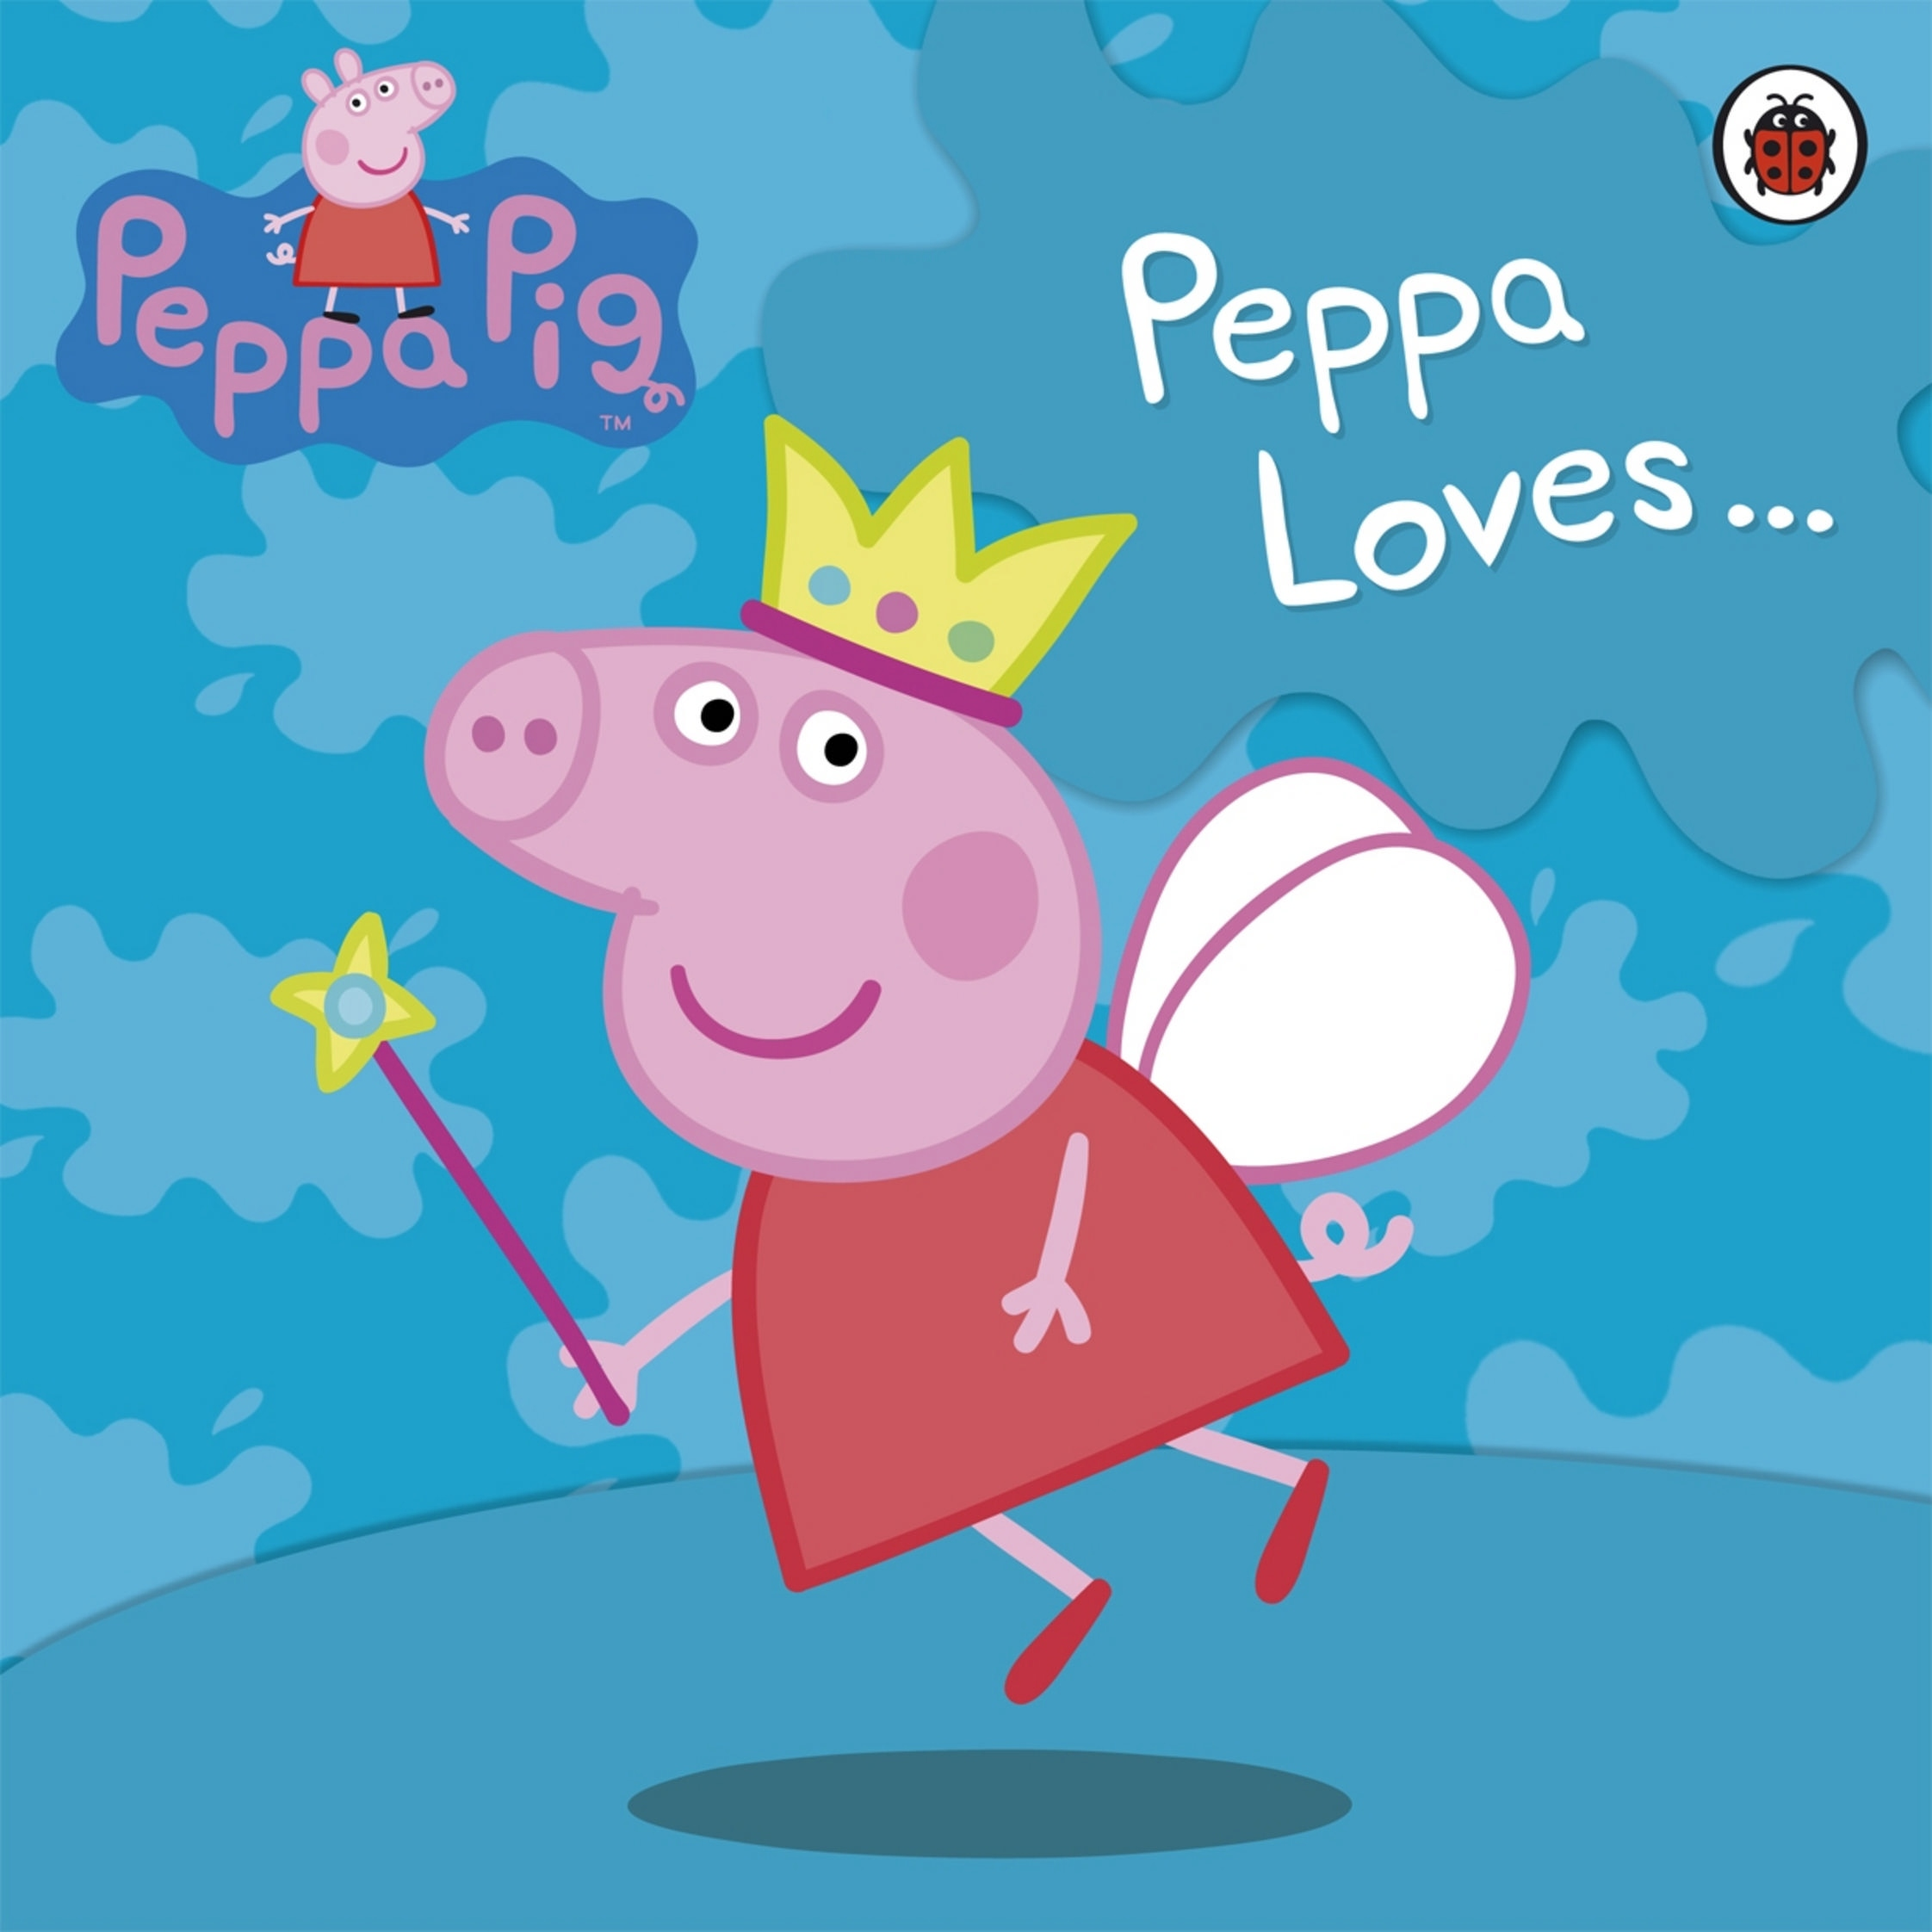 Peppa Pig Toys Peppa Pig Desktop Wallpaper 2244x2244